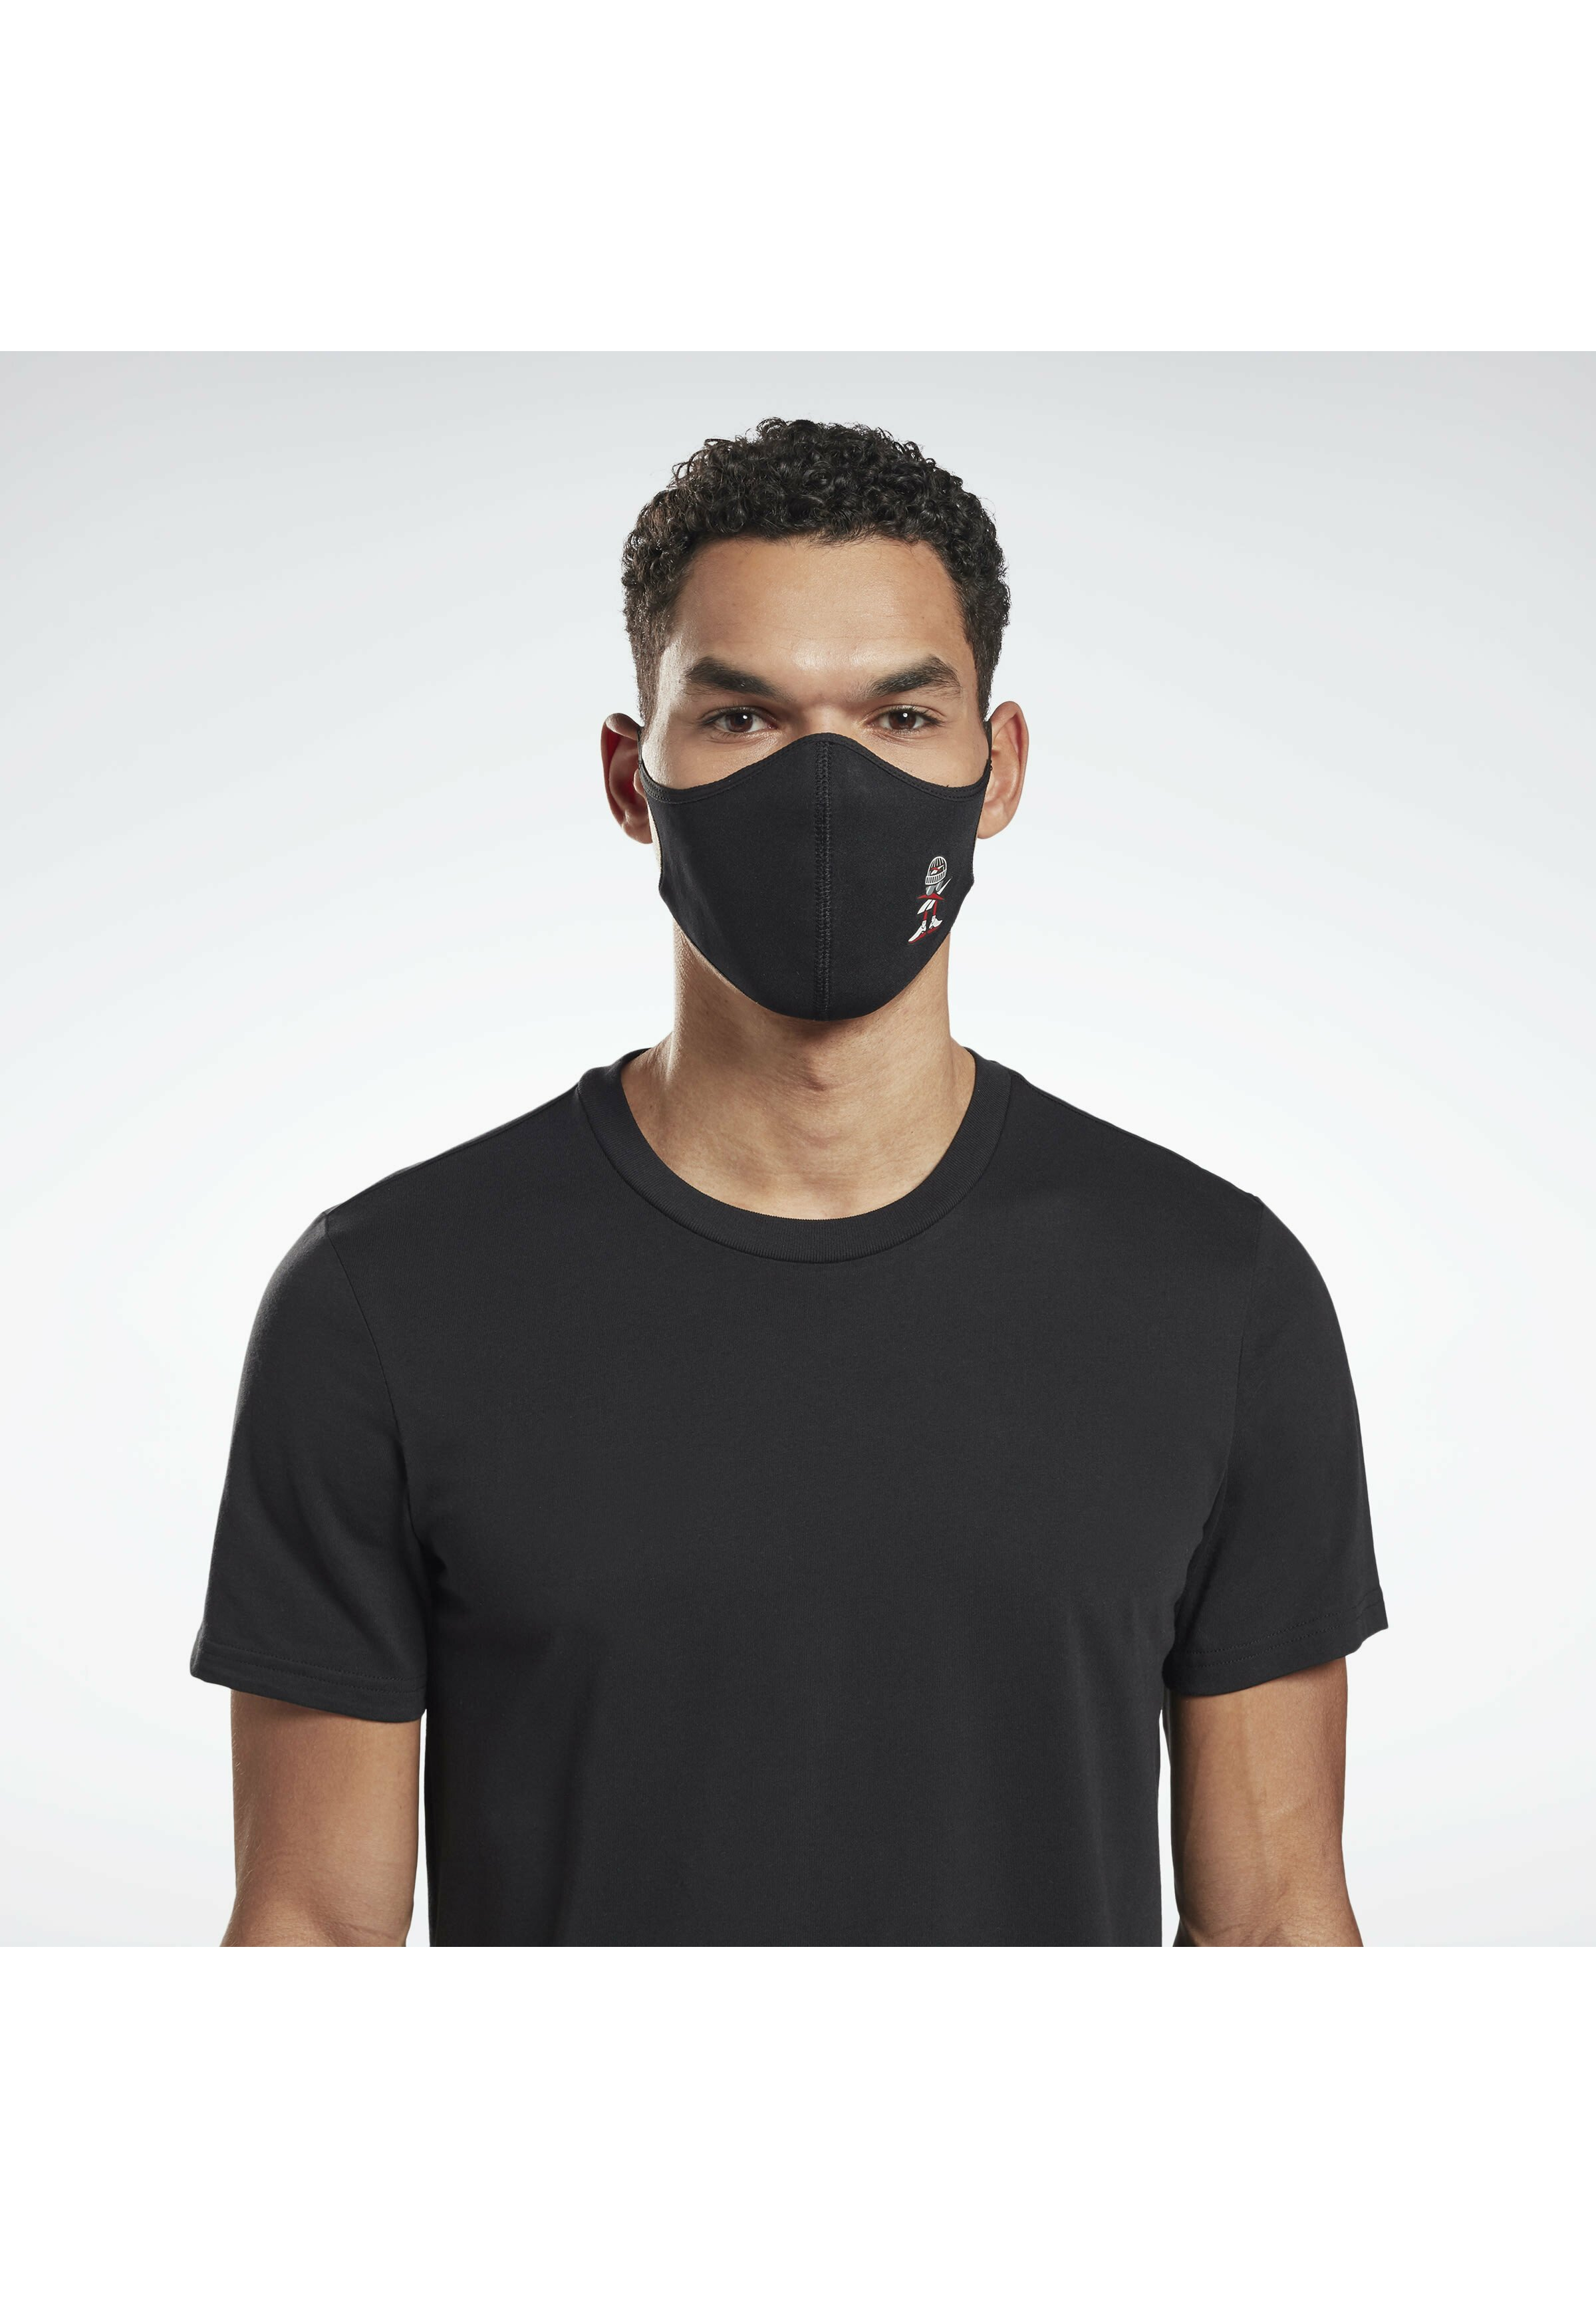 Women FACE COVER LARGE (ICON) TRAINING - Community mask